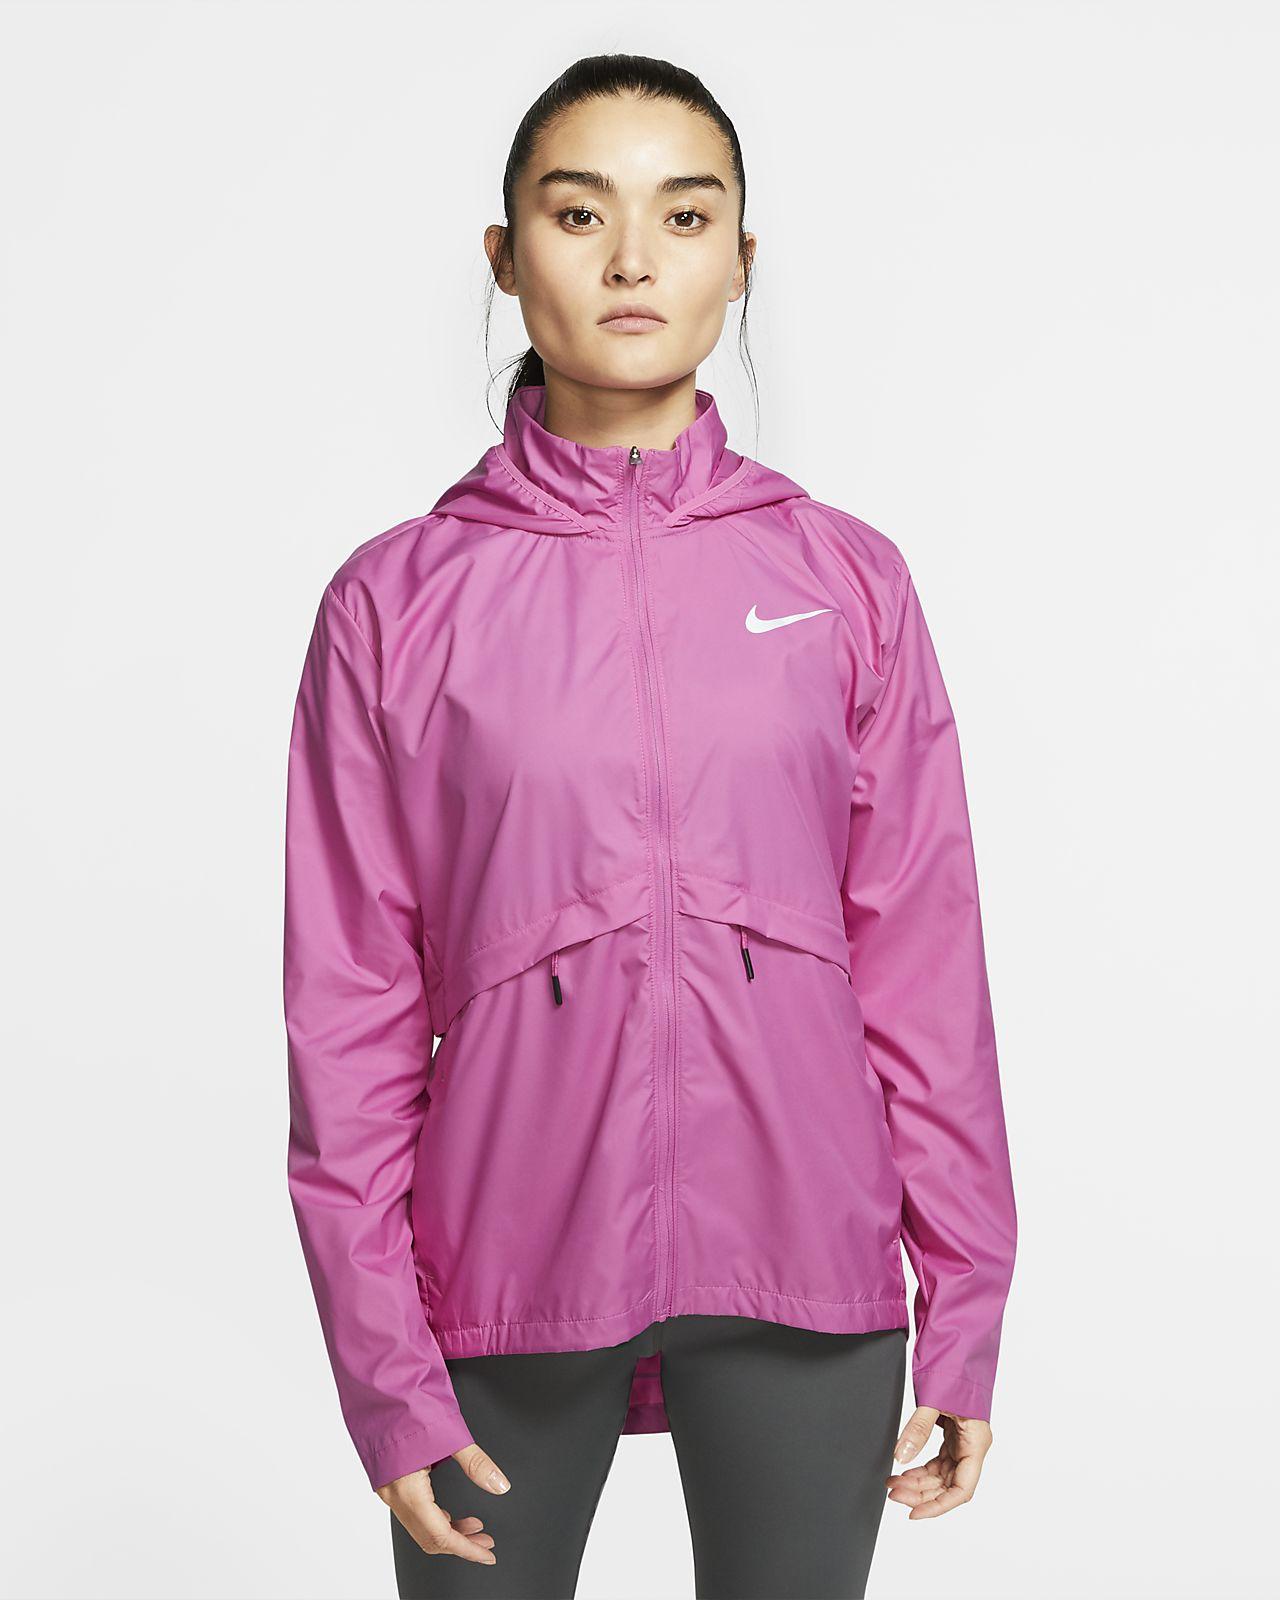 Nike Essential nedpakkbar løpejakke for regn til dame